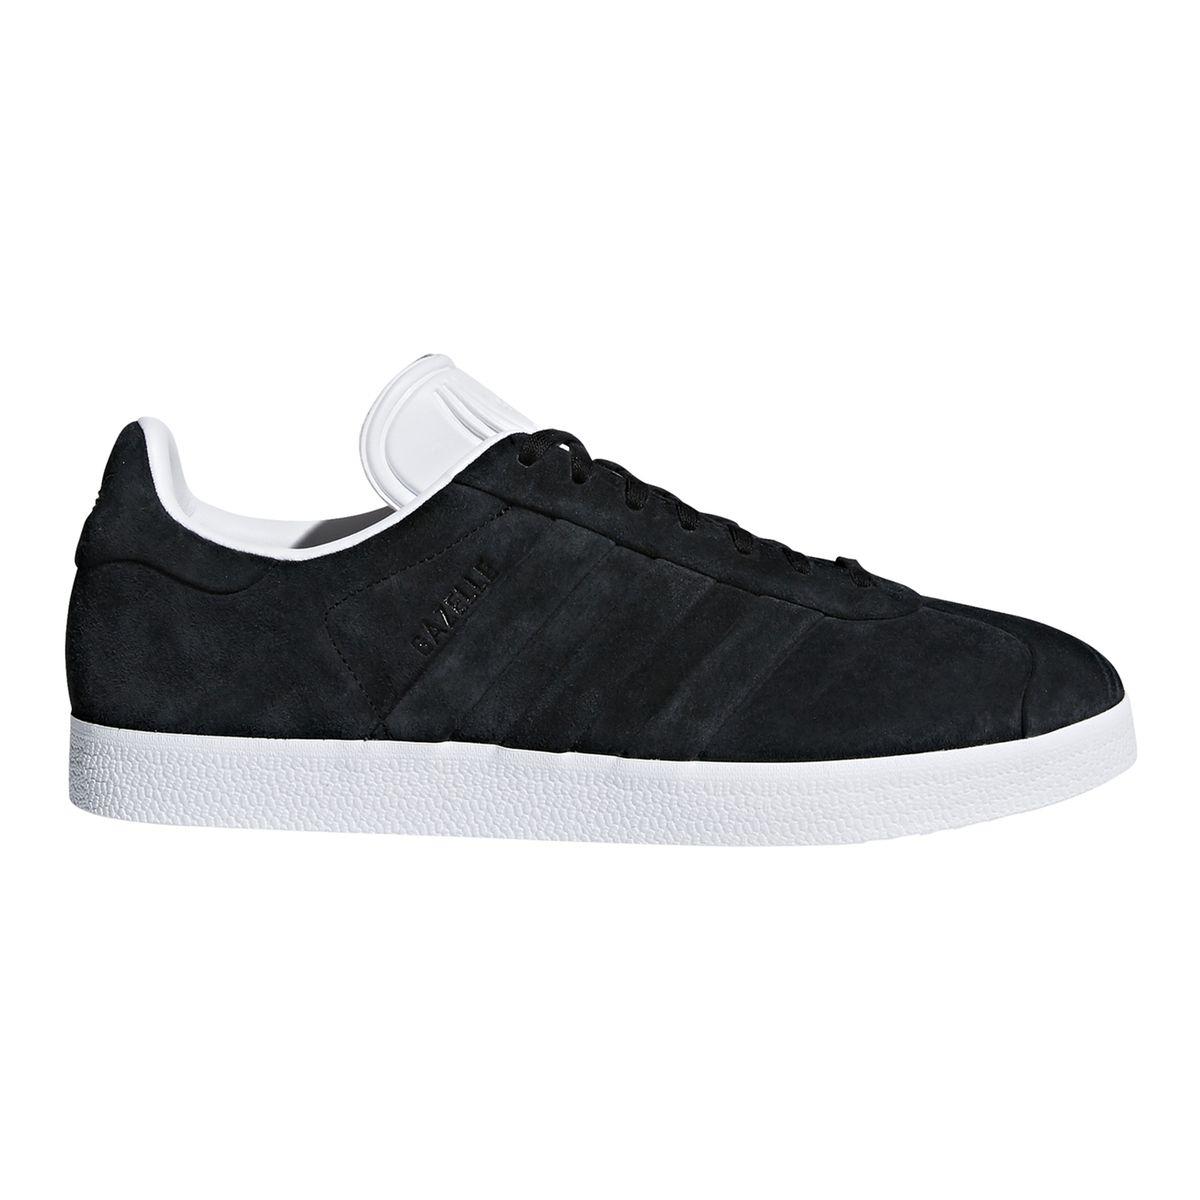 Baskets gazelle stitch and masculin noir adidas...